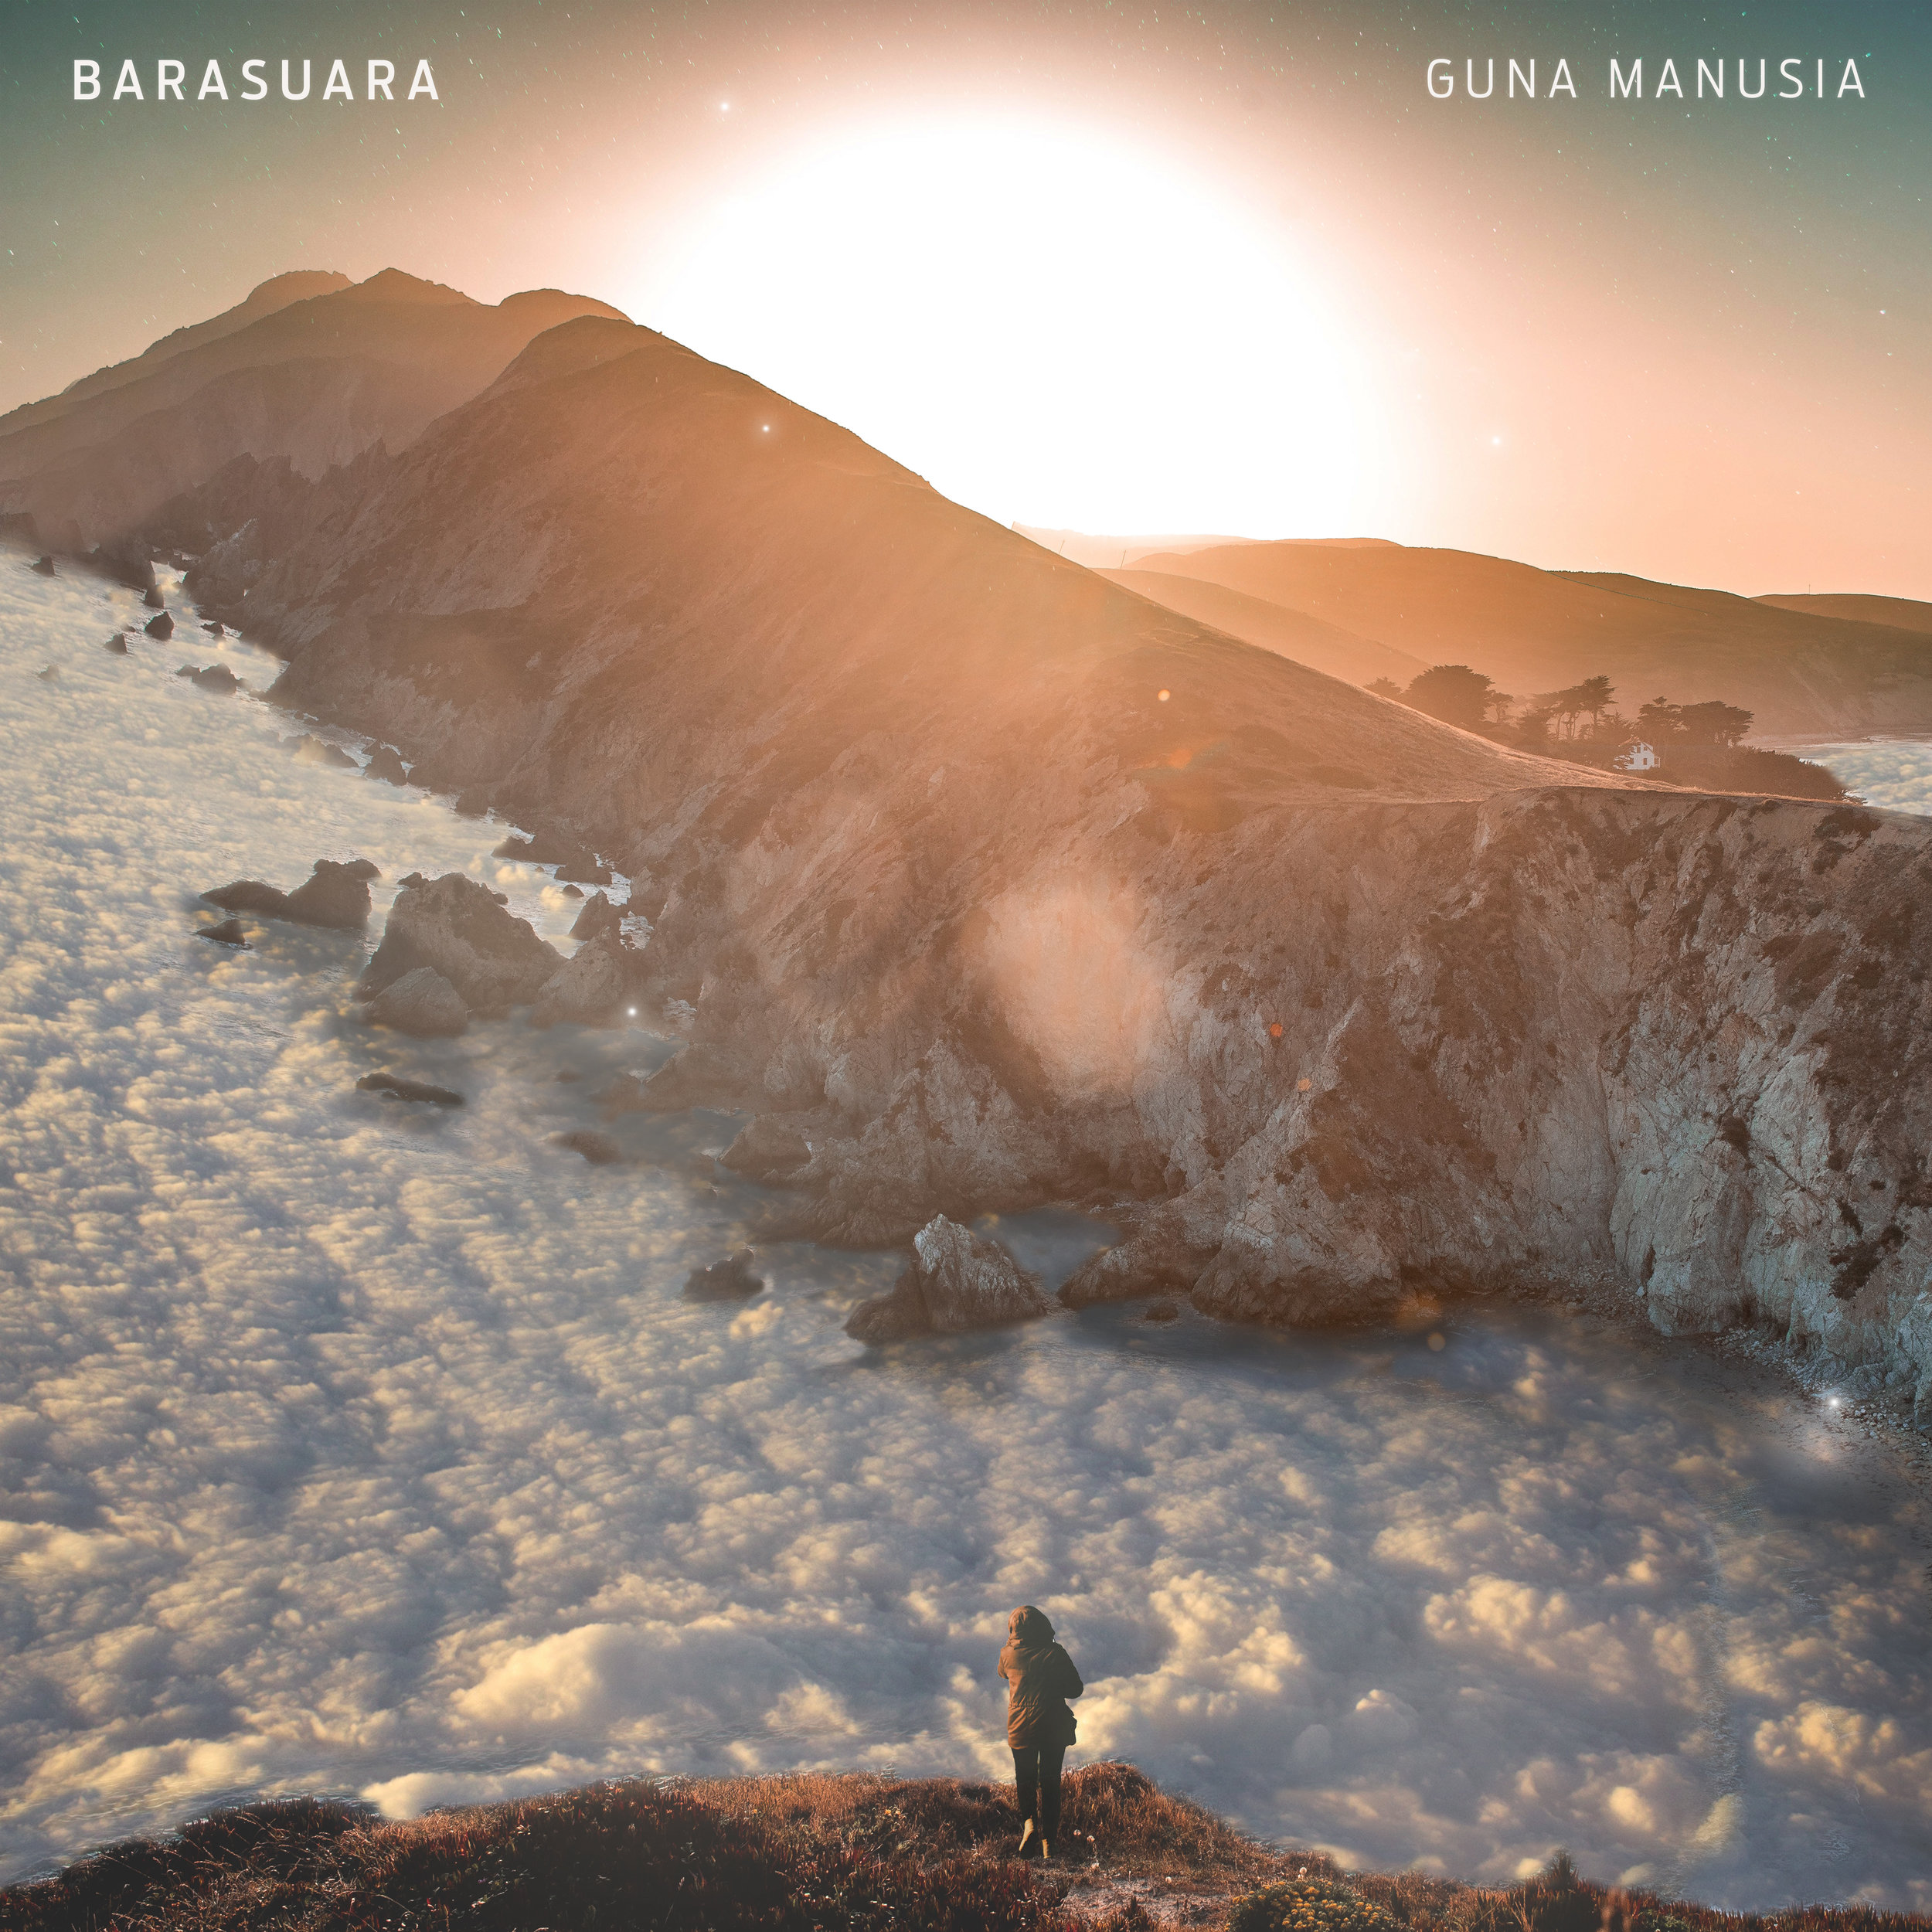 GUNA MANUSIA - BARASUARA